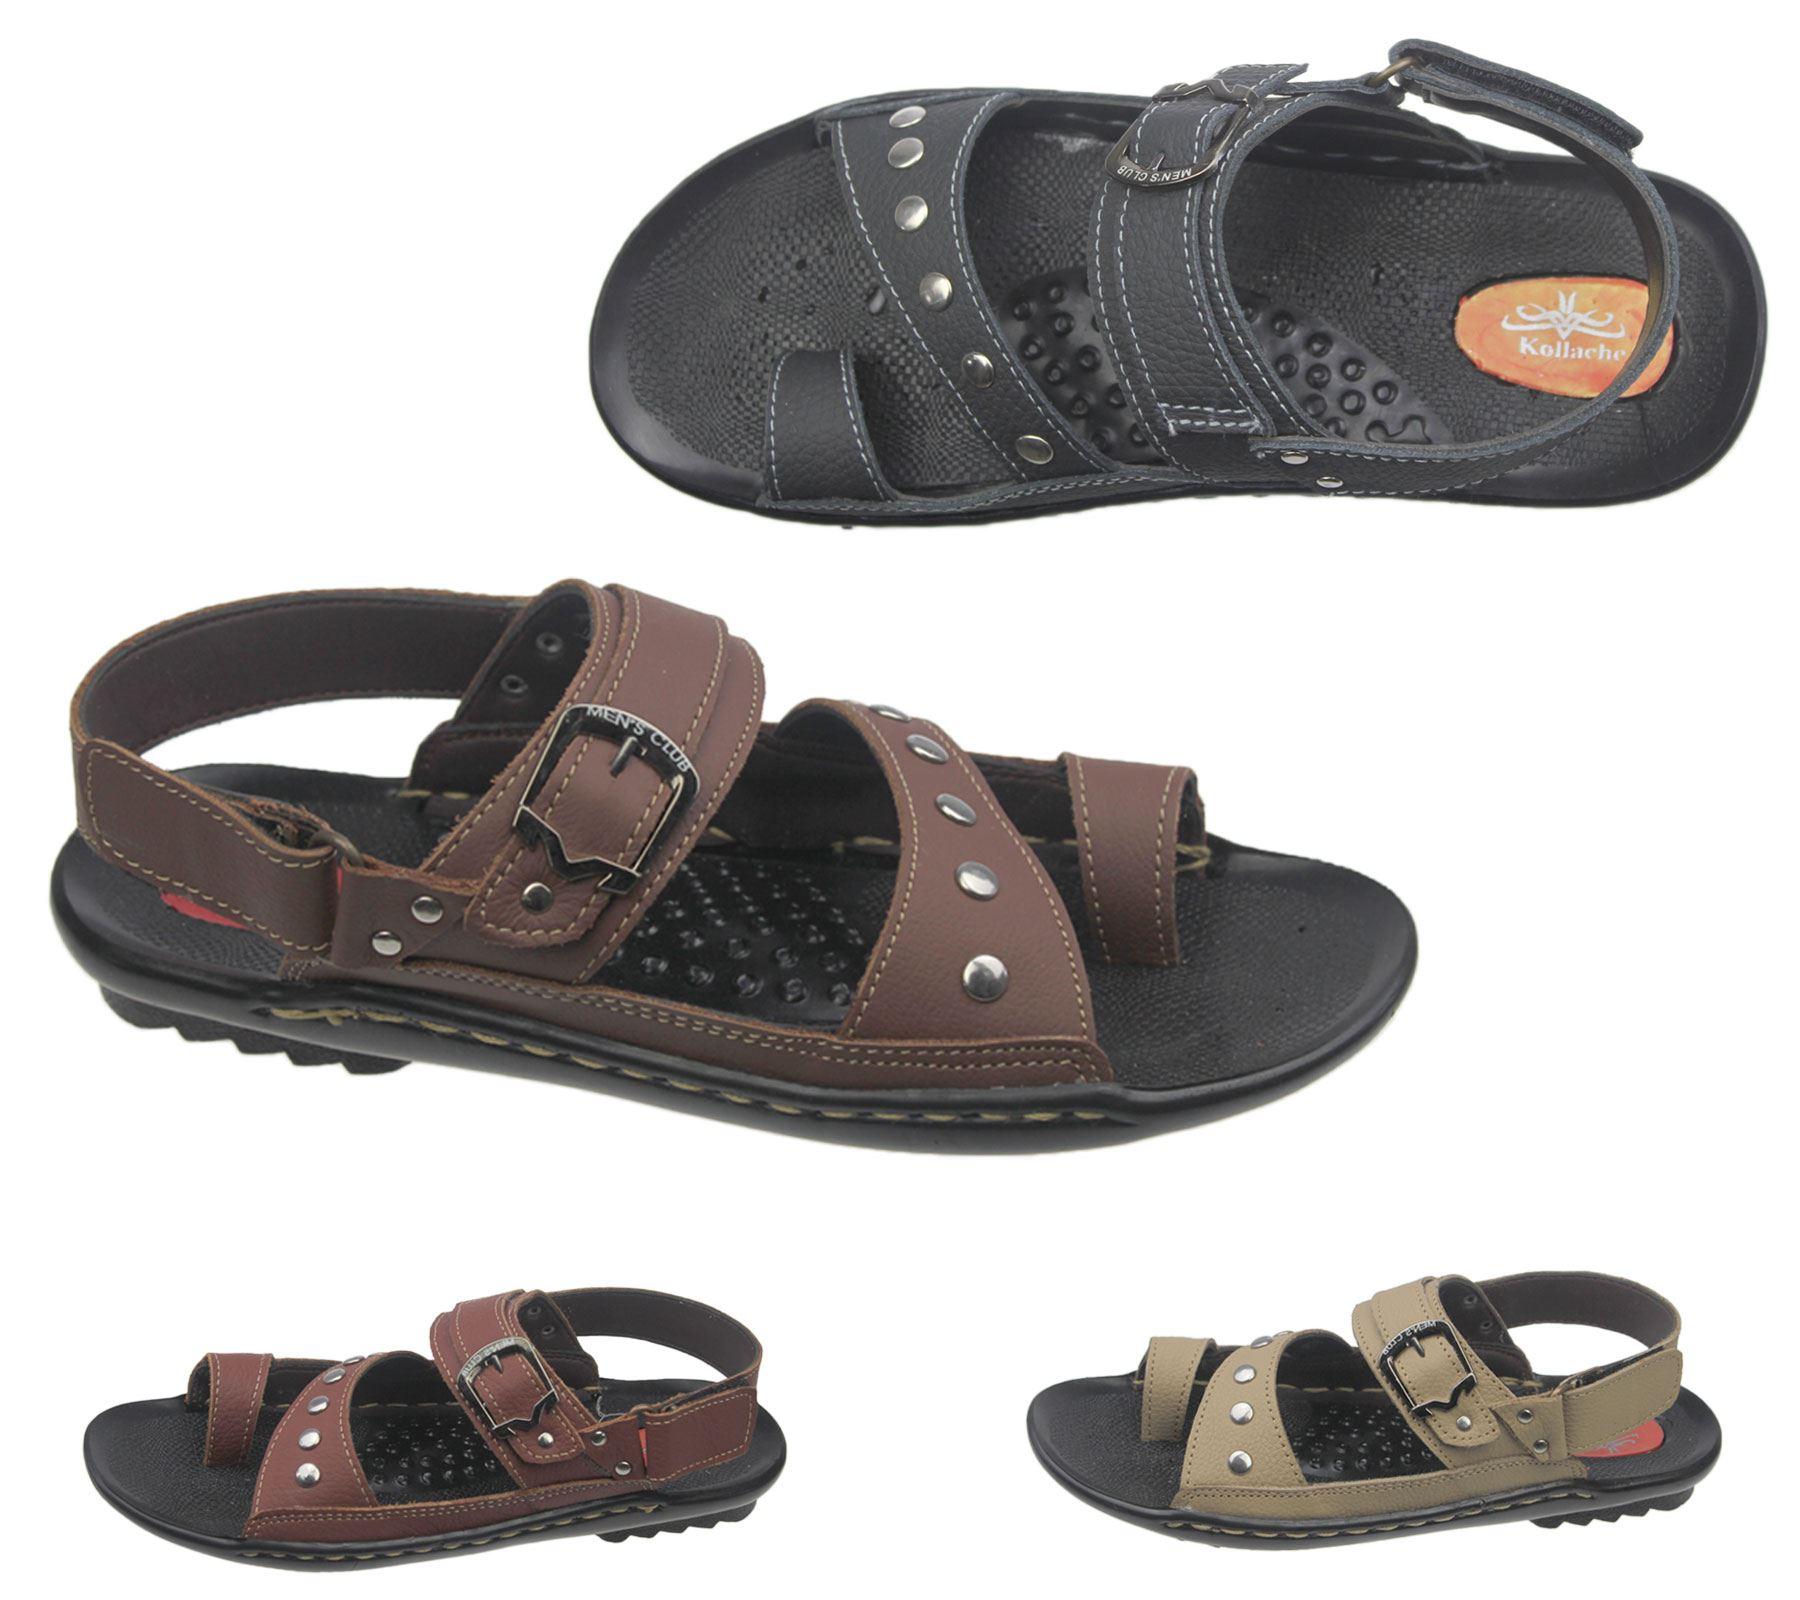 Mens Veclro Sandals Casual Beach Walking Beach Slipper Leather Fashion Flip Flop